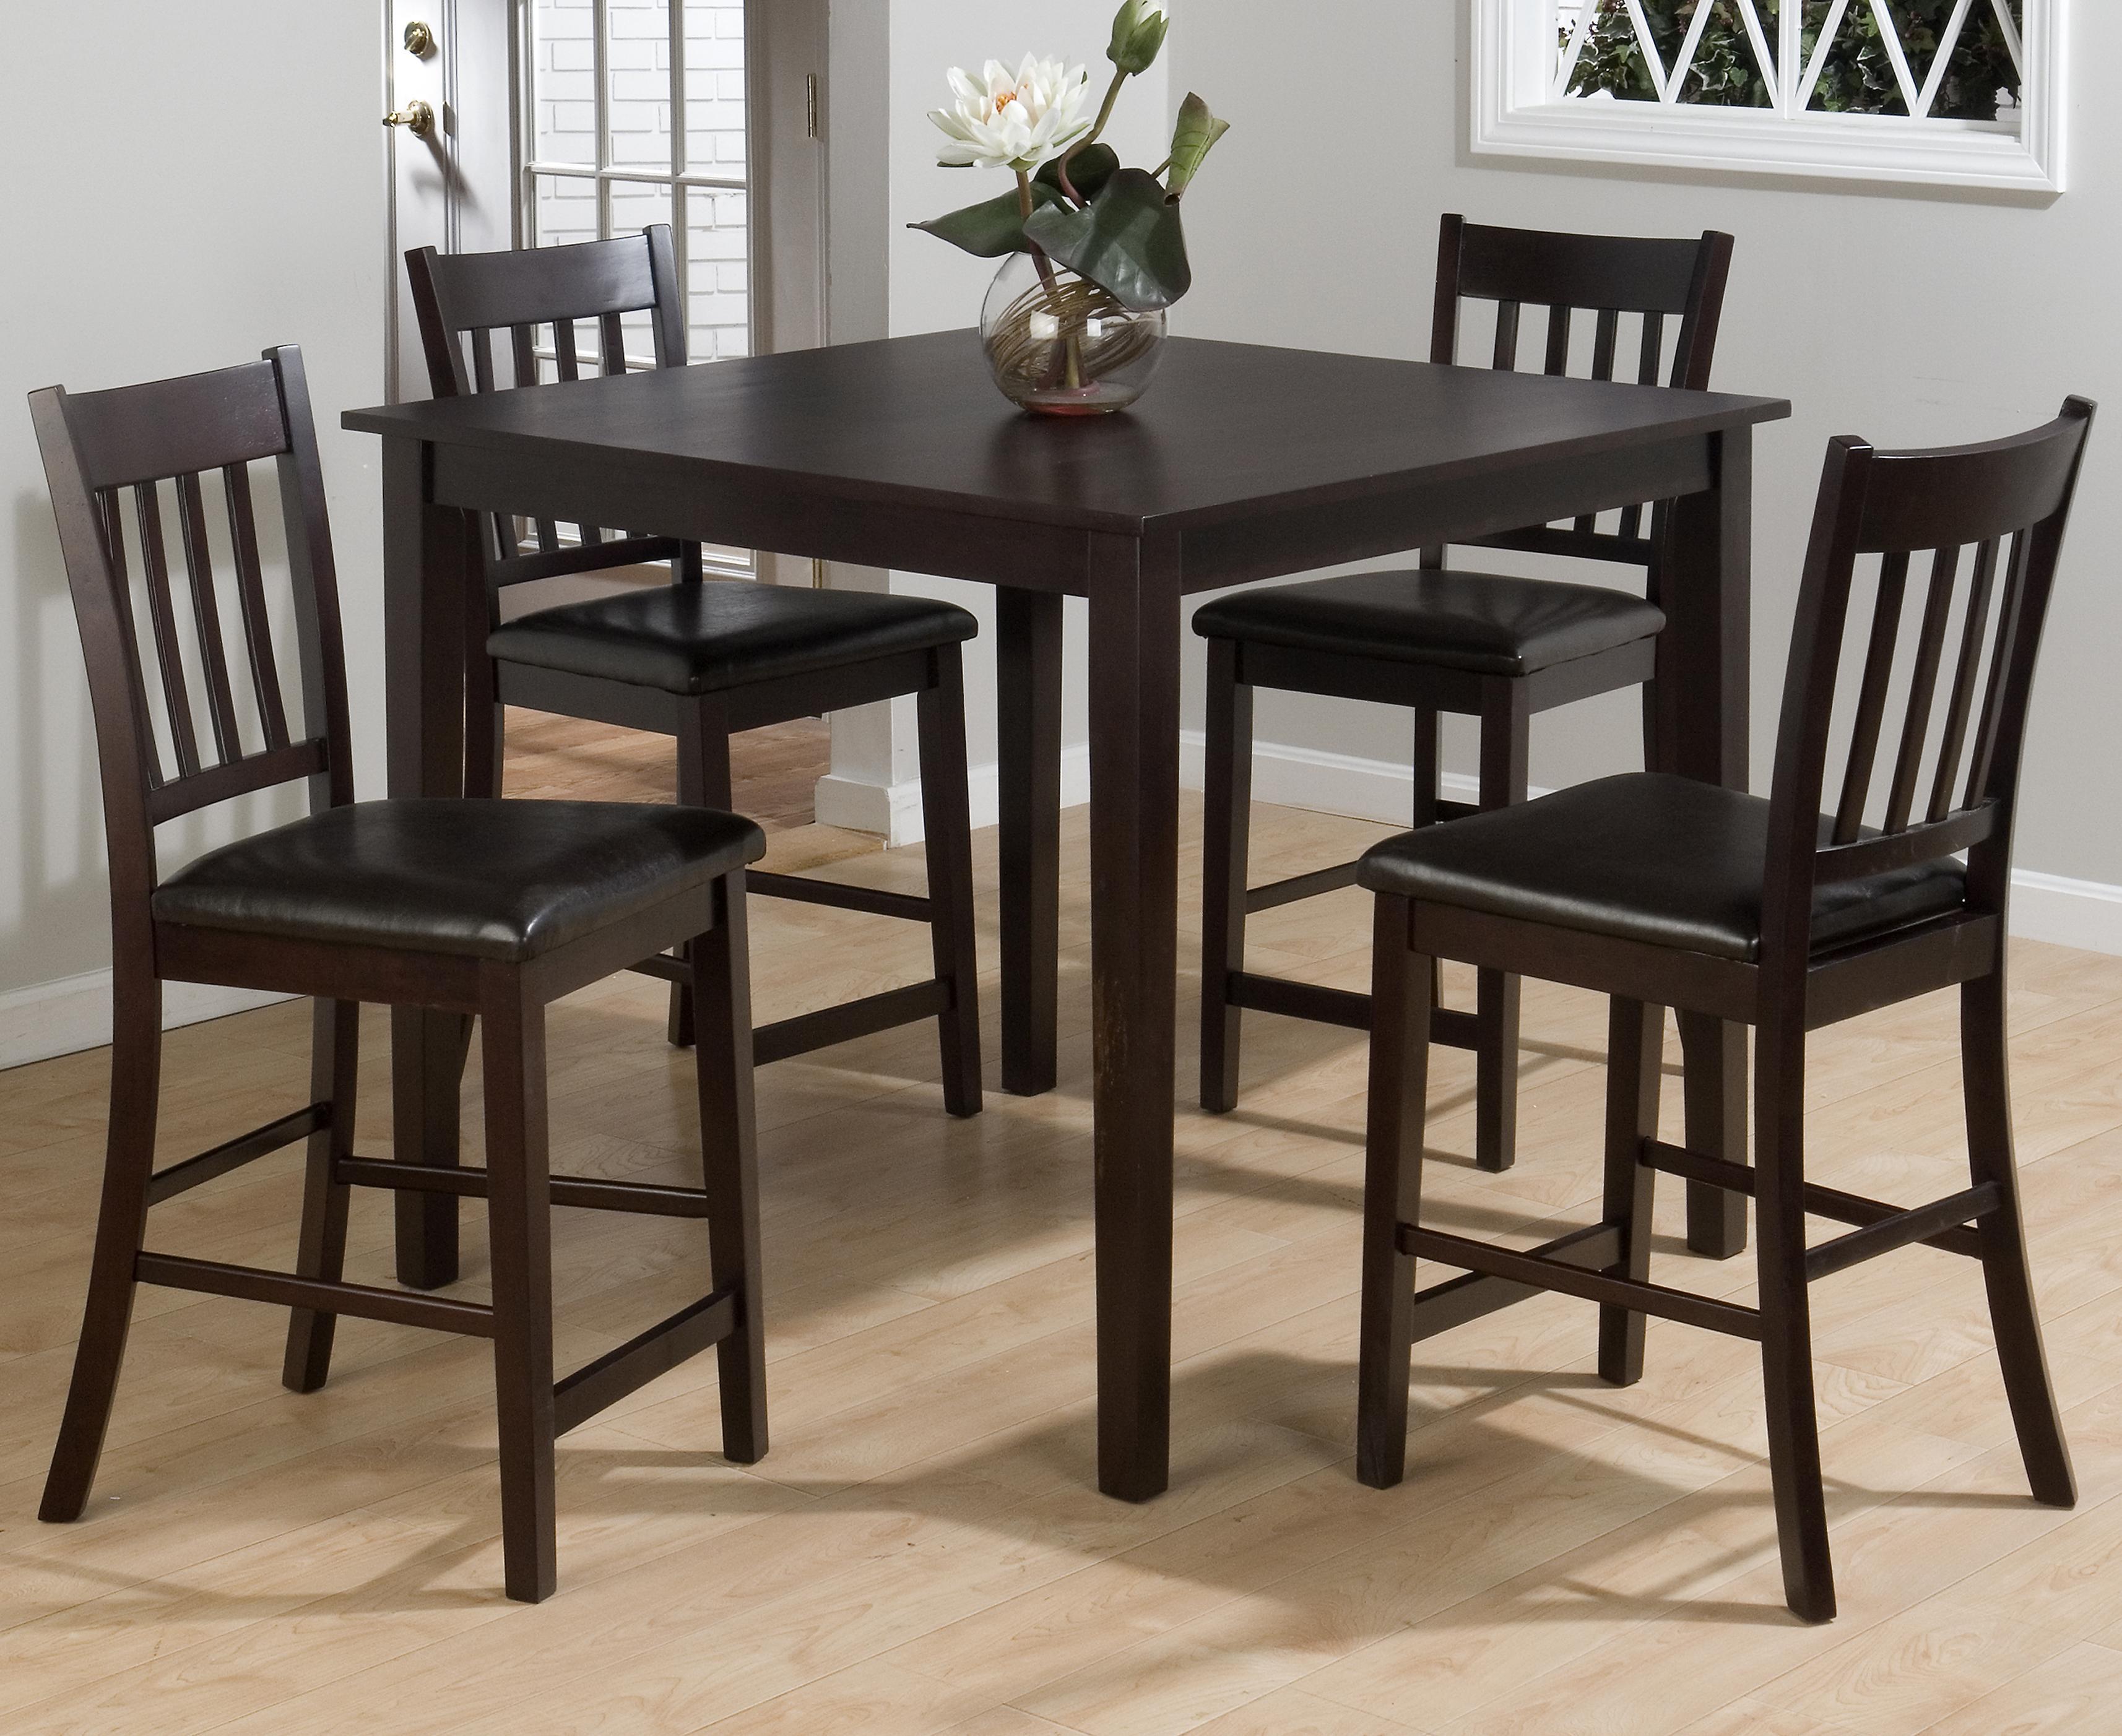 Jofran Marin County 5-Piece Pub Table Set - Item Number 892 & Marin County 5-Piece Counter Height Table u0026 Counter Chair Set ...